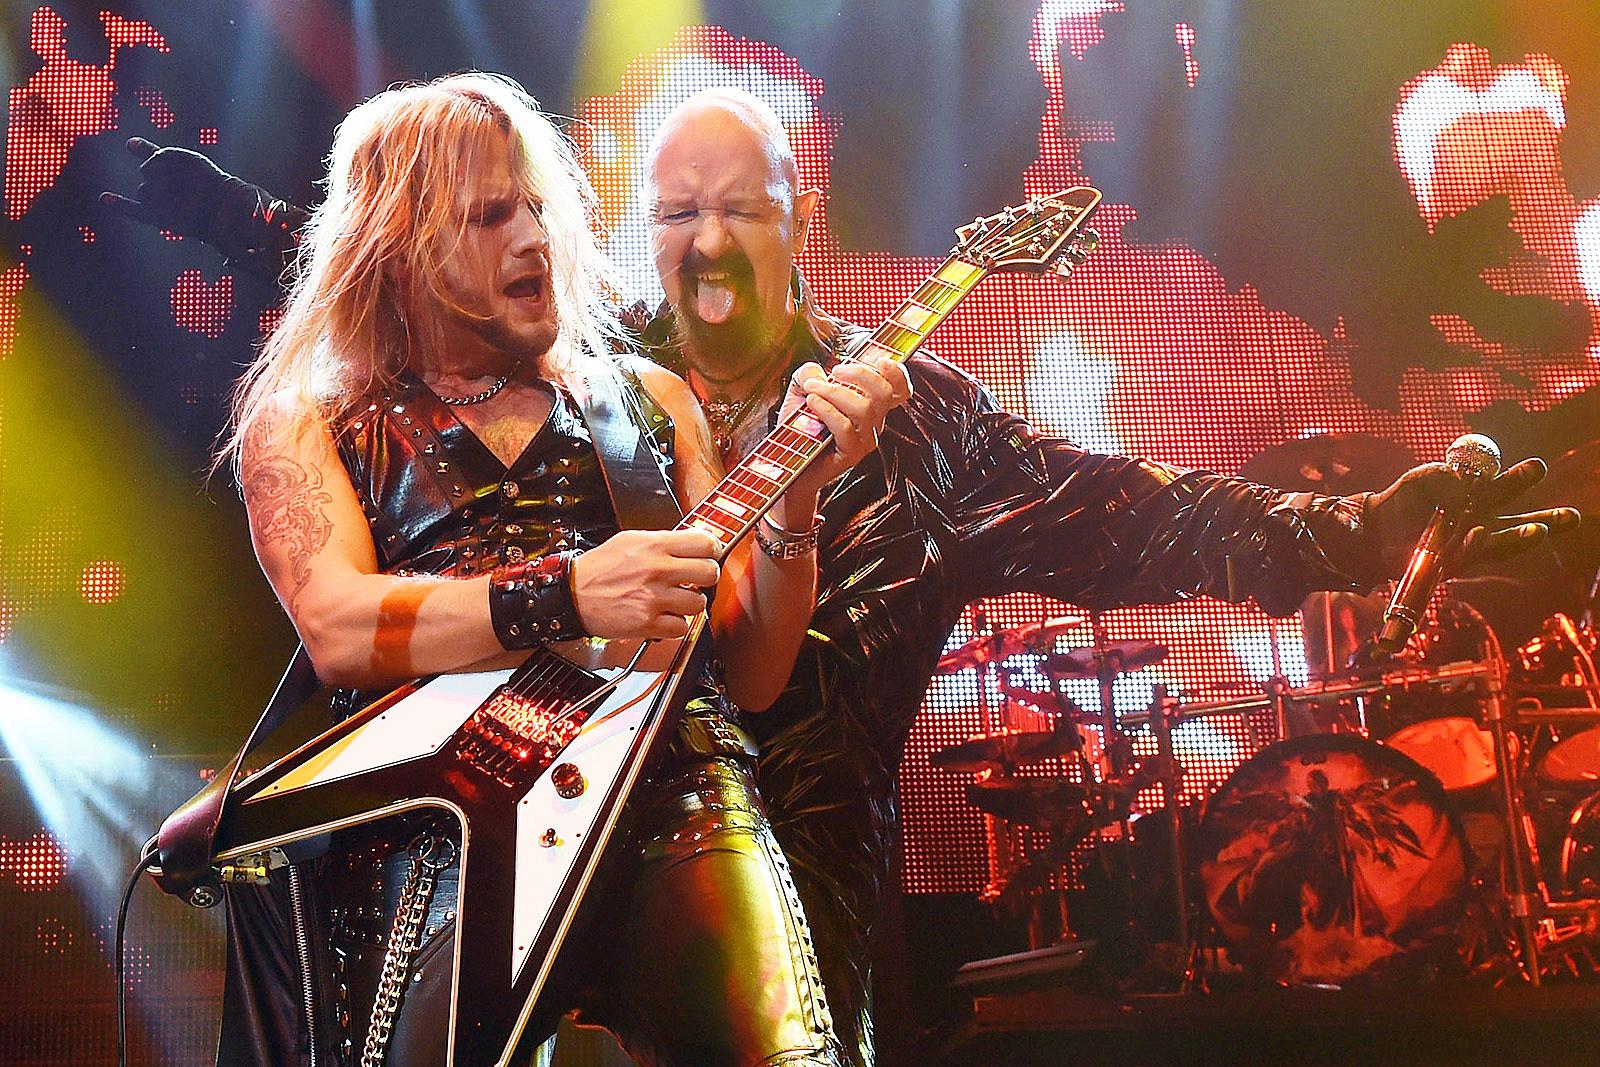 Judas Priest's 'Firepower' Is Their Highest Charting Album Ever